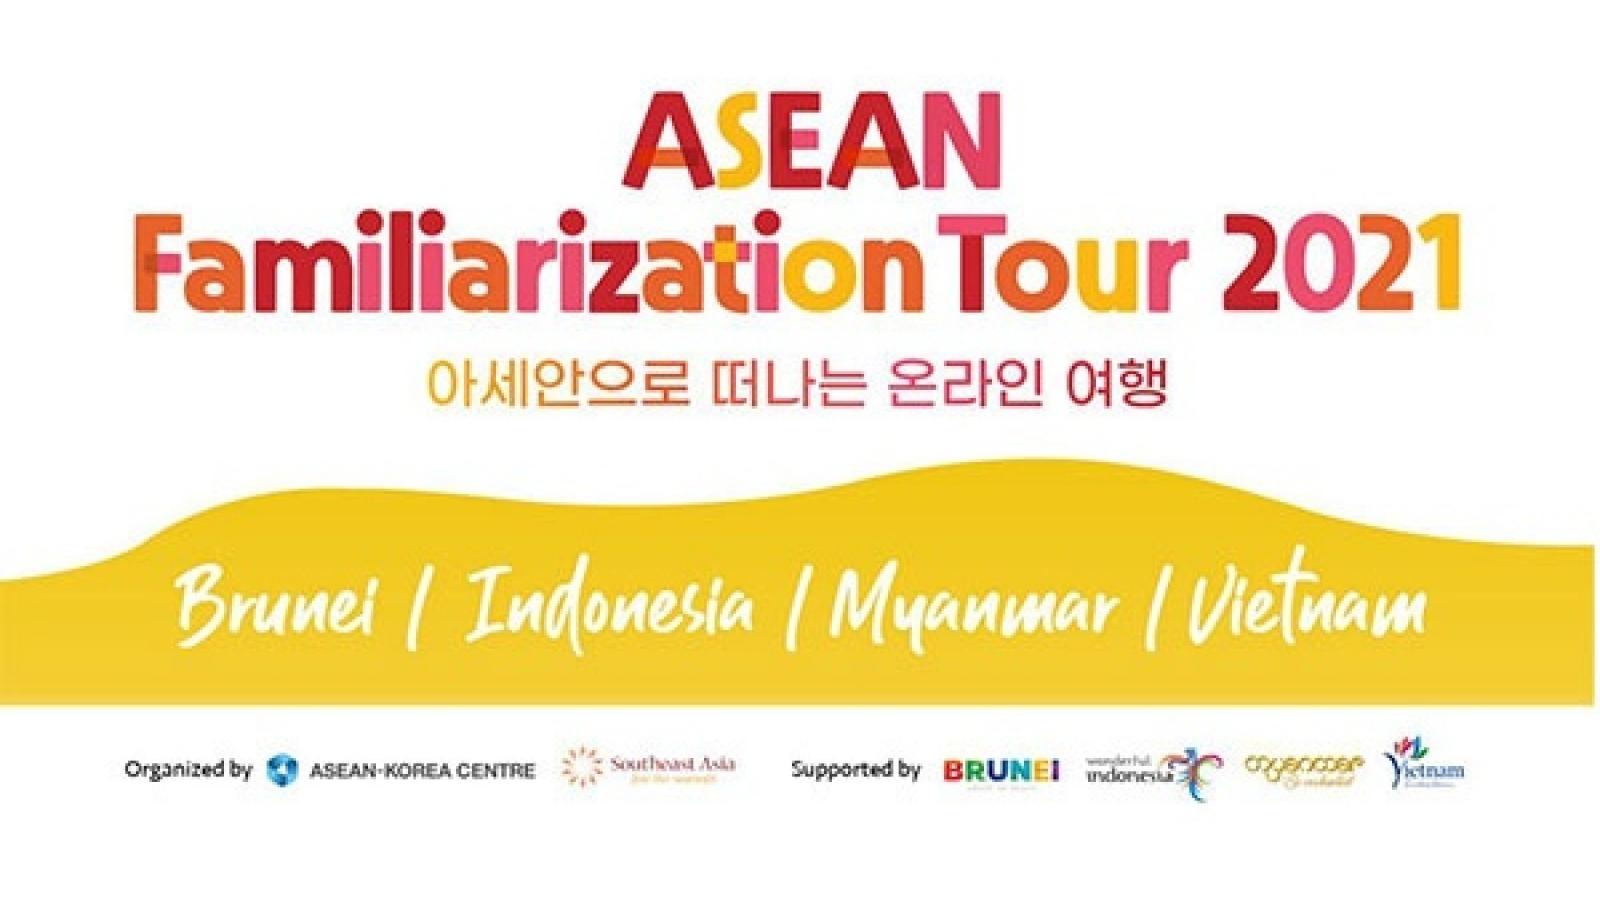 Vietnam tourism to be shown at ASEAN Familiarization Tour 2021